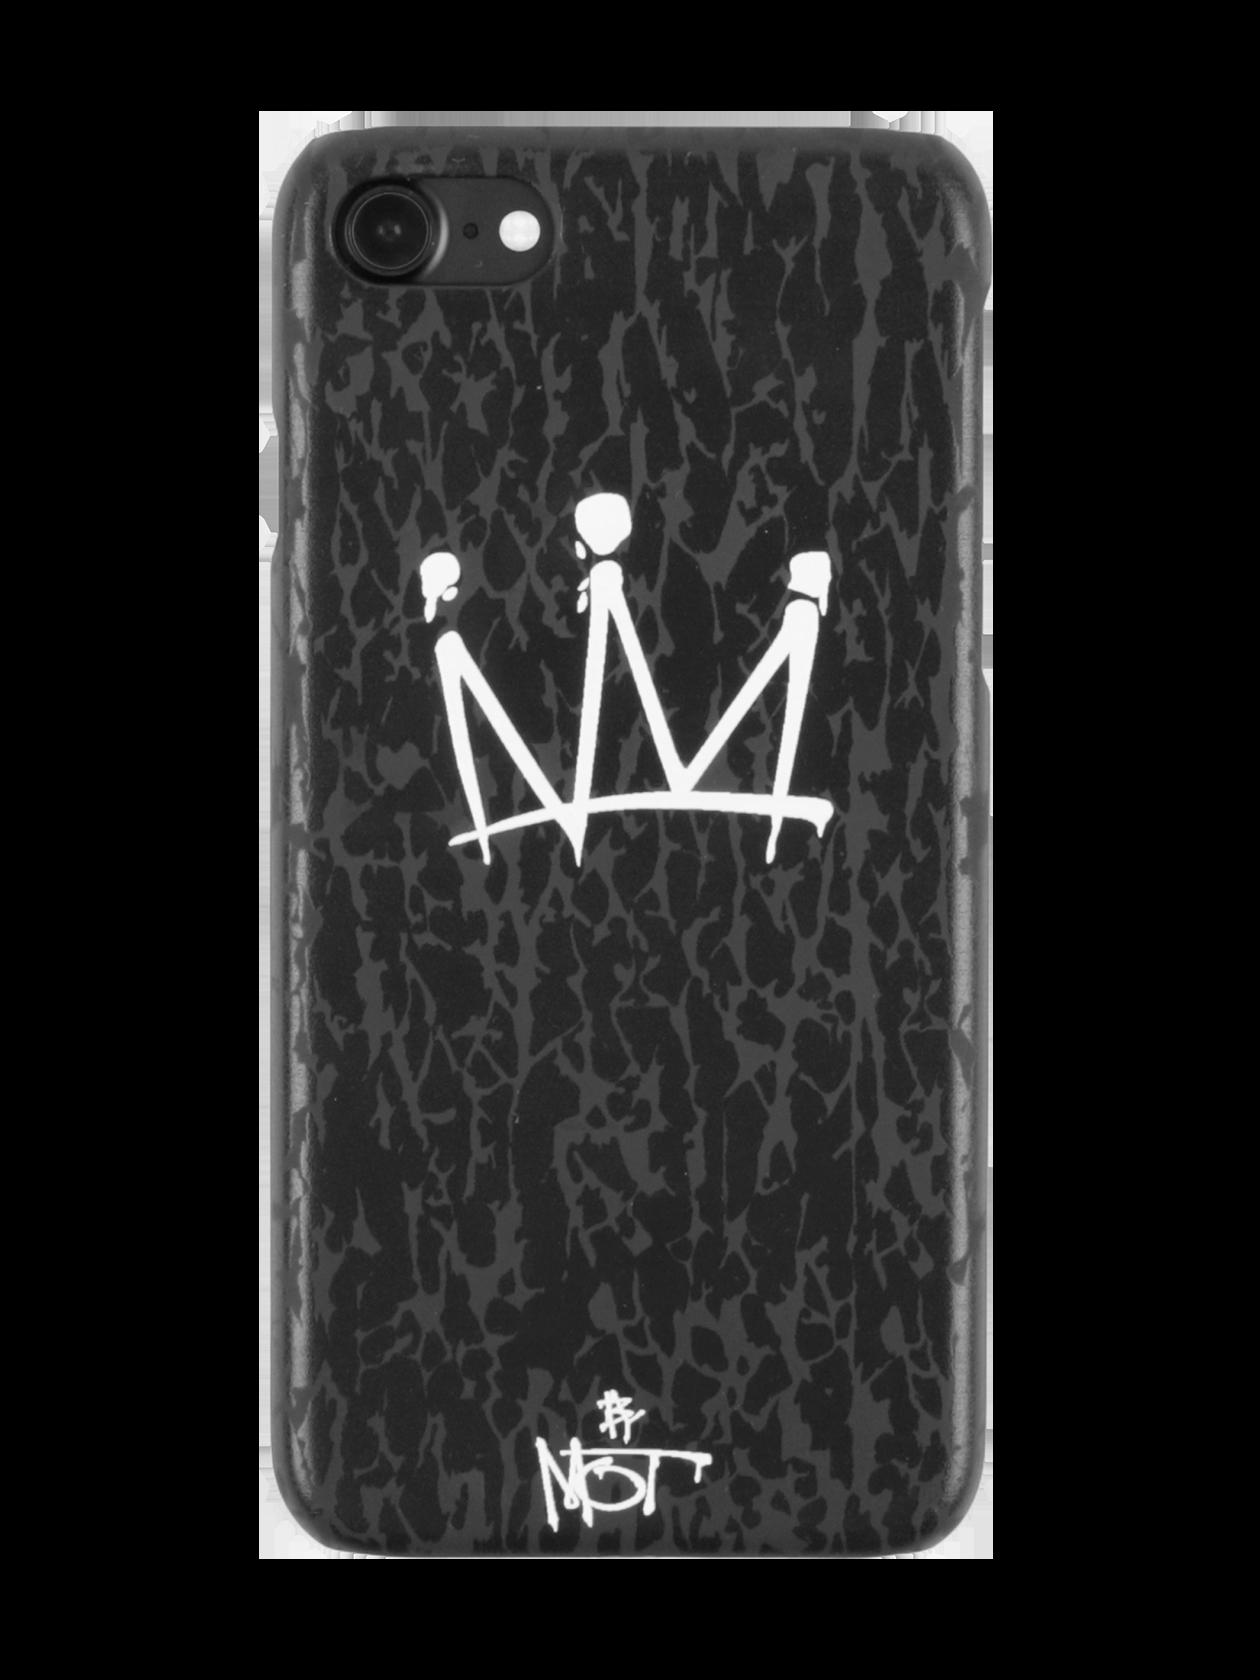 Чехол для телефона MOT CROWN<br><br>Размер: 6+<br>Цвет: Черный<br>Пол: Унисекс